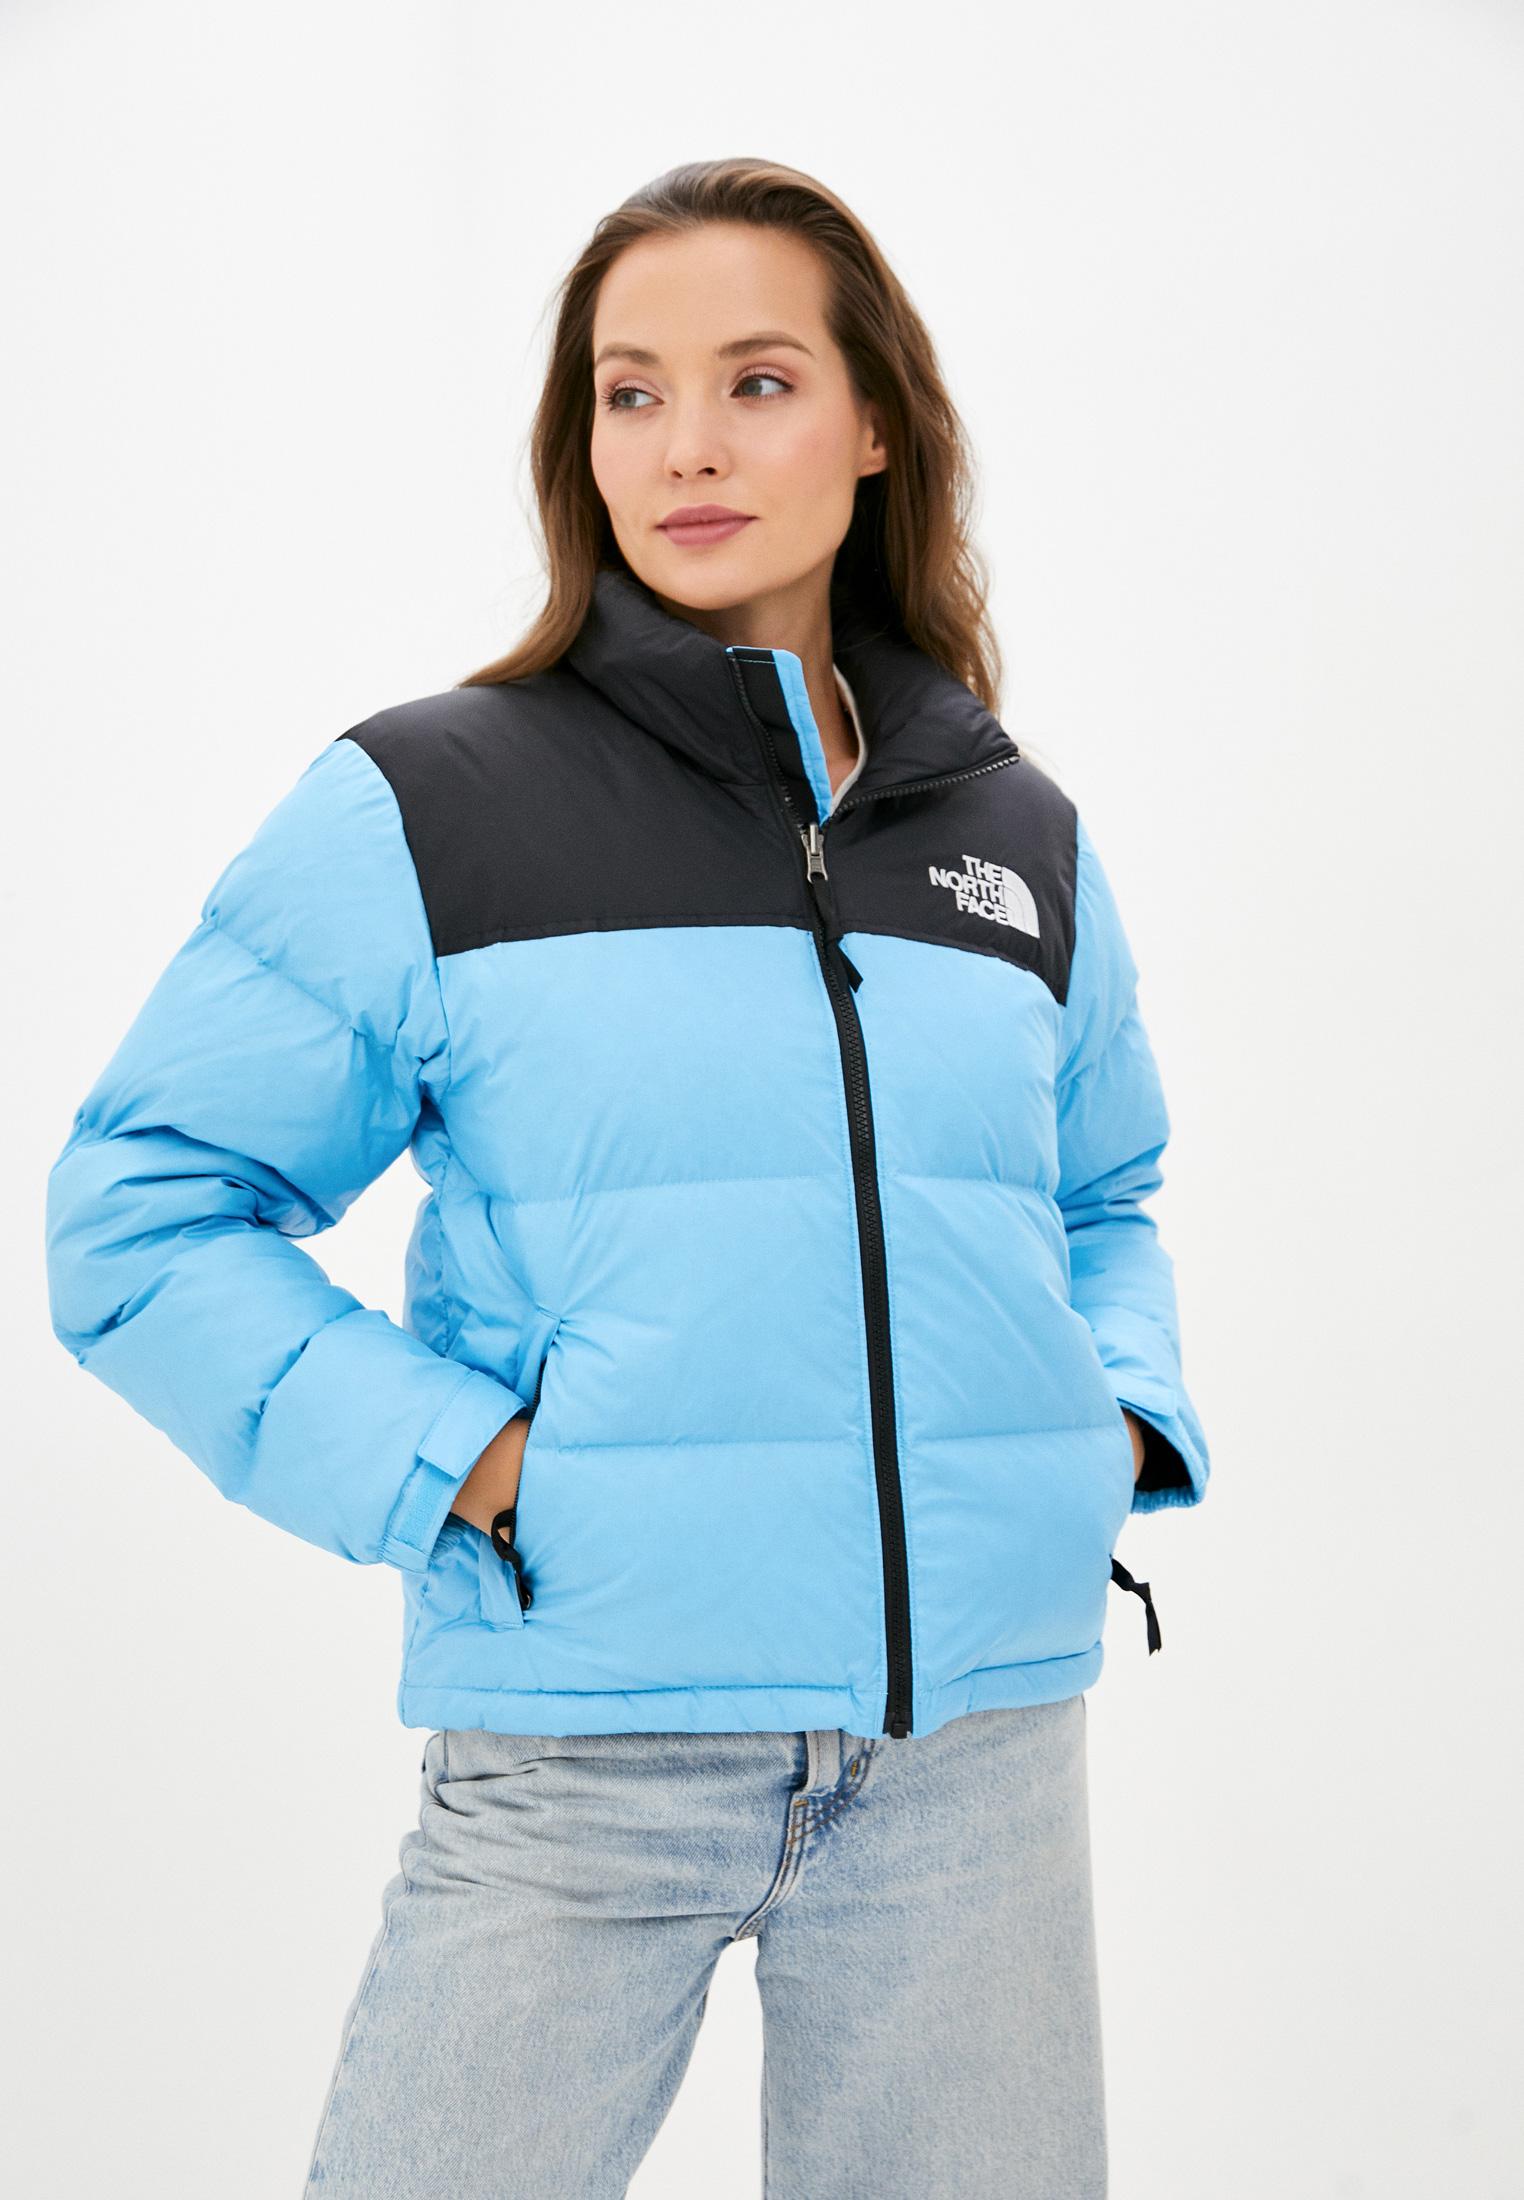 Женская верхняя одежда The North Face (Зе Норт Фейс) TA3XEOL8P